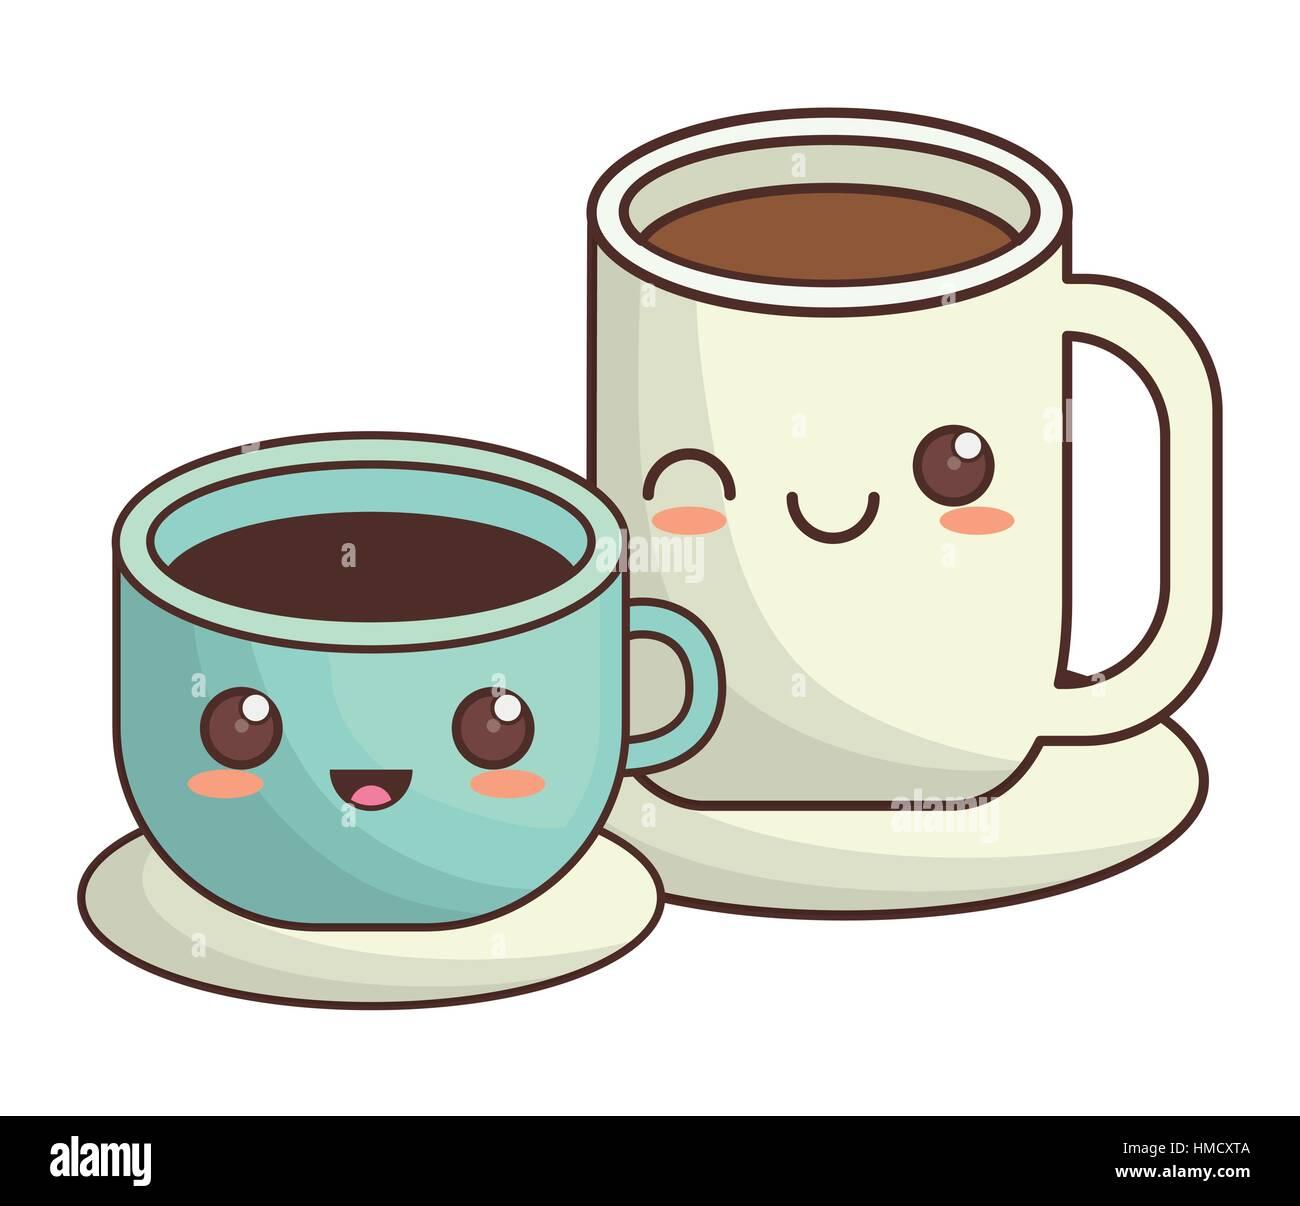 Japanese Coffee Mugs Coffee Cup Kawaii Icon Image Vector Illustration Design